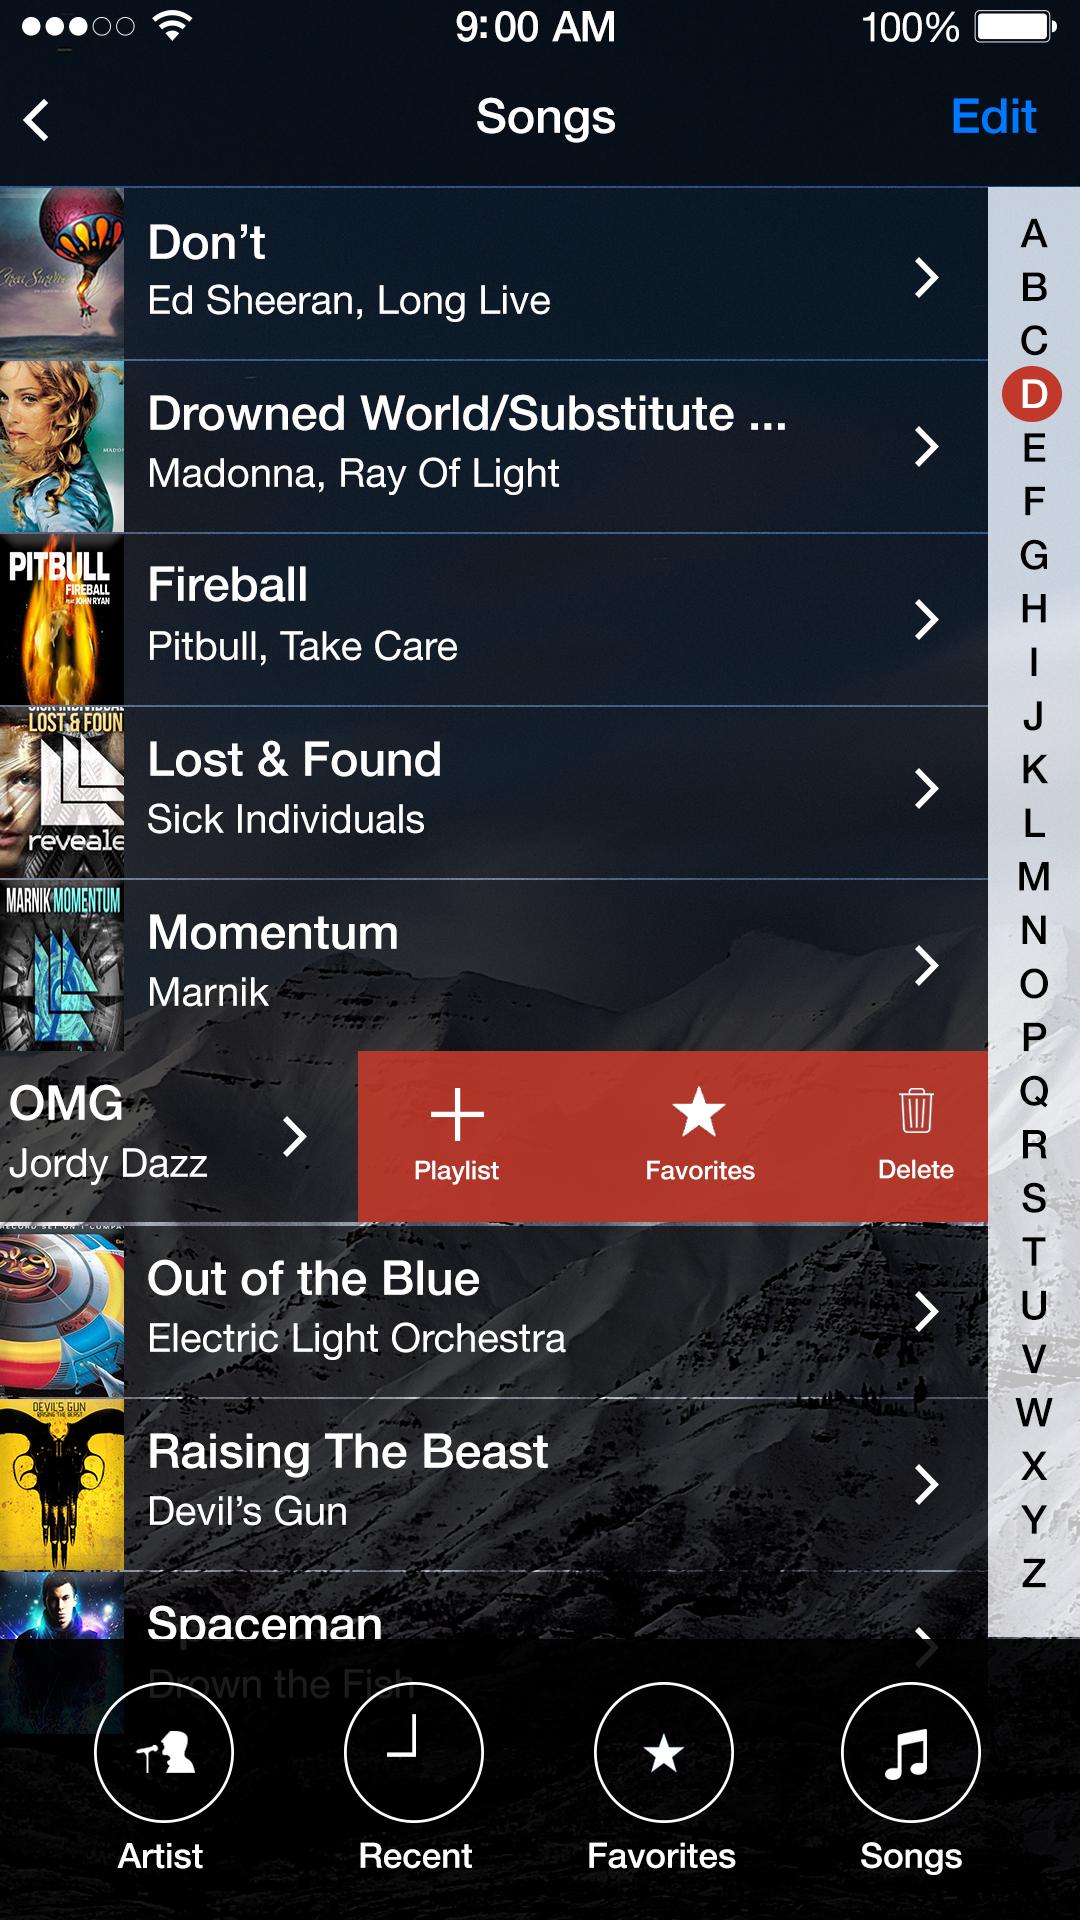 05.2 songs ios music app